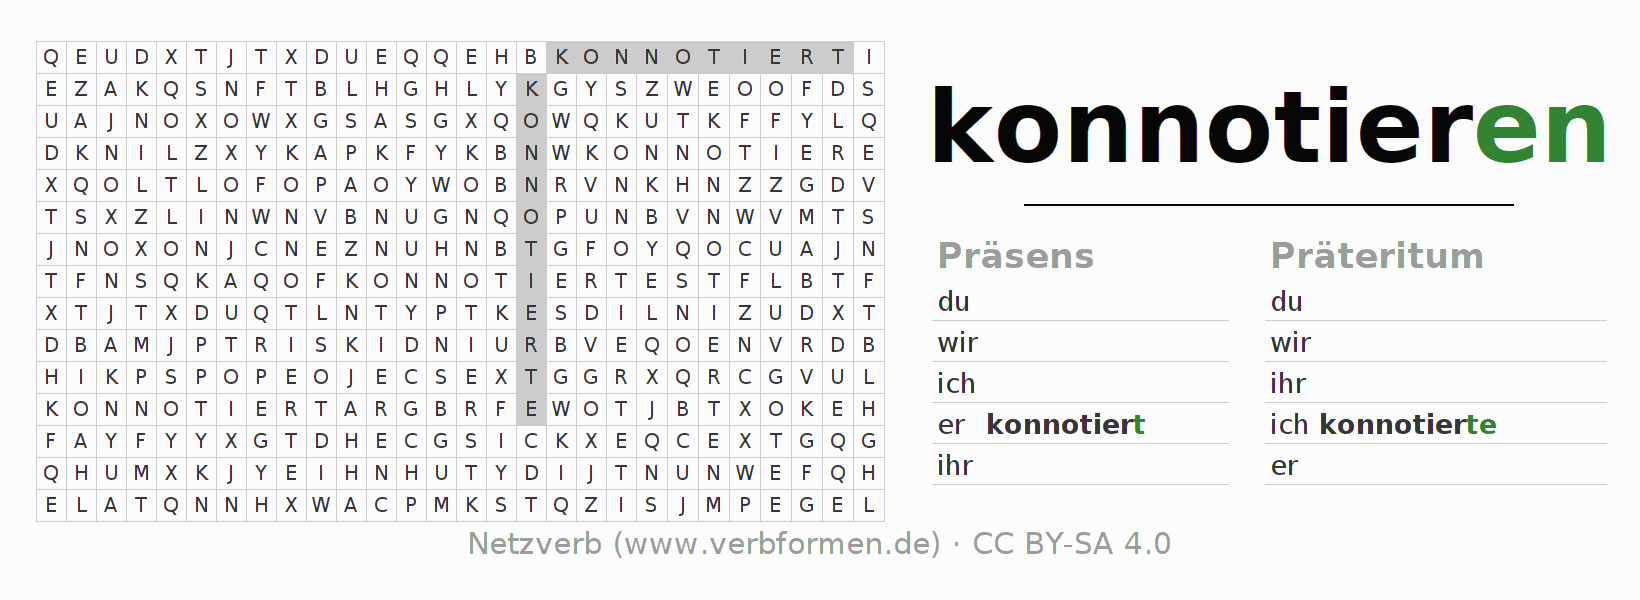 Modern Konnotation Arbeitsblatt Pdf Ensign - Kindergarten ...